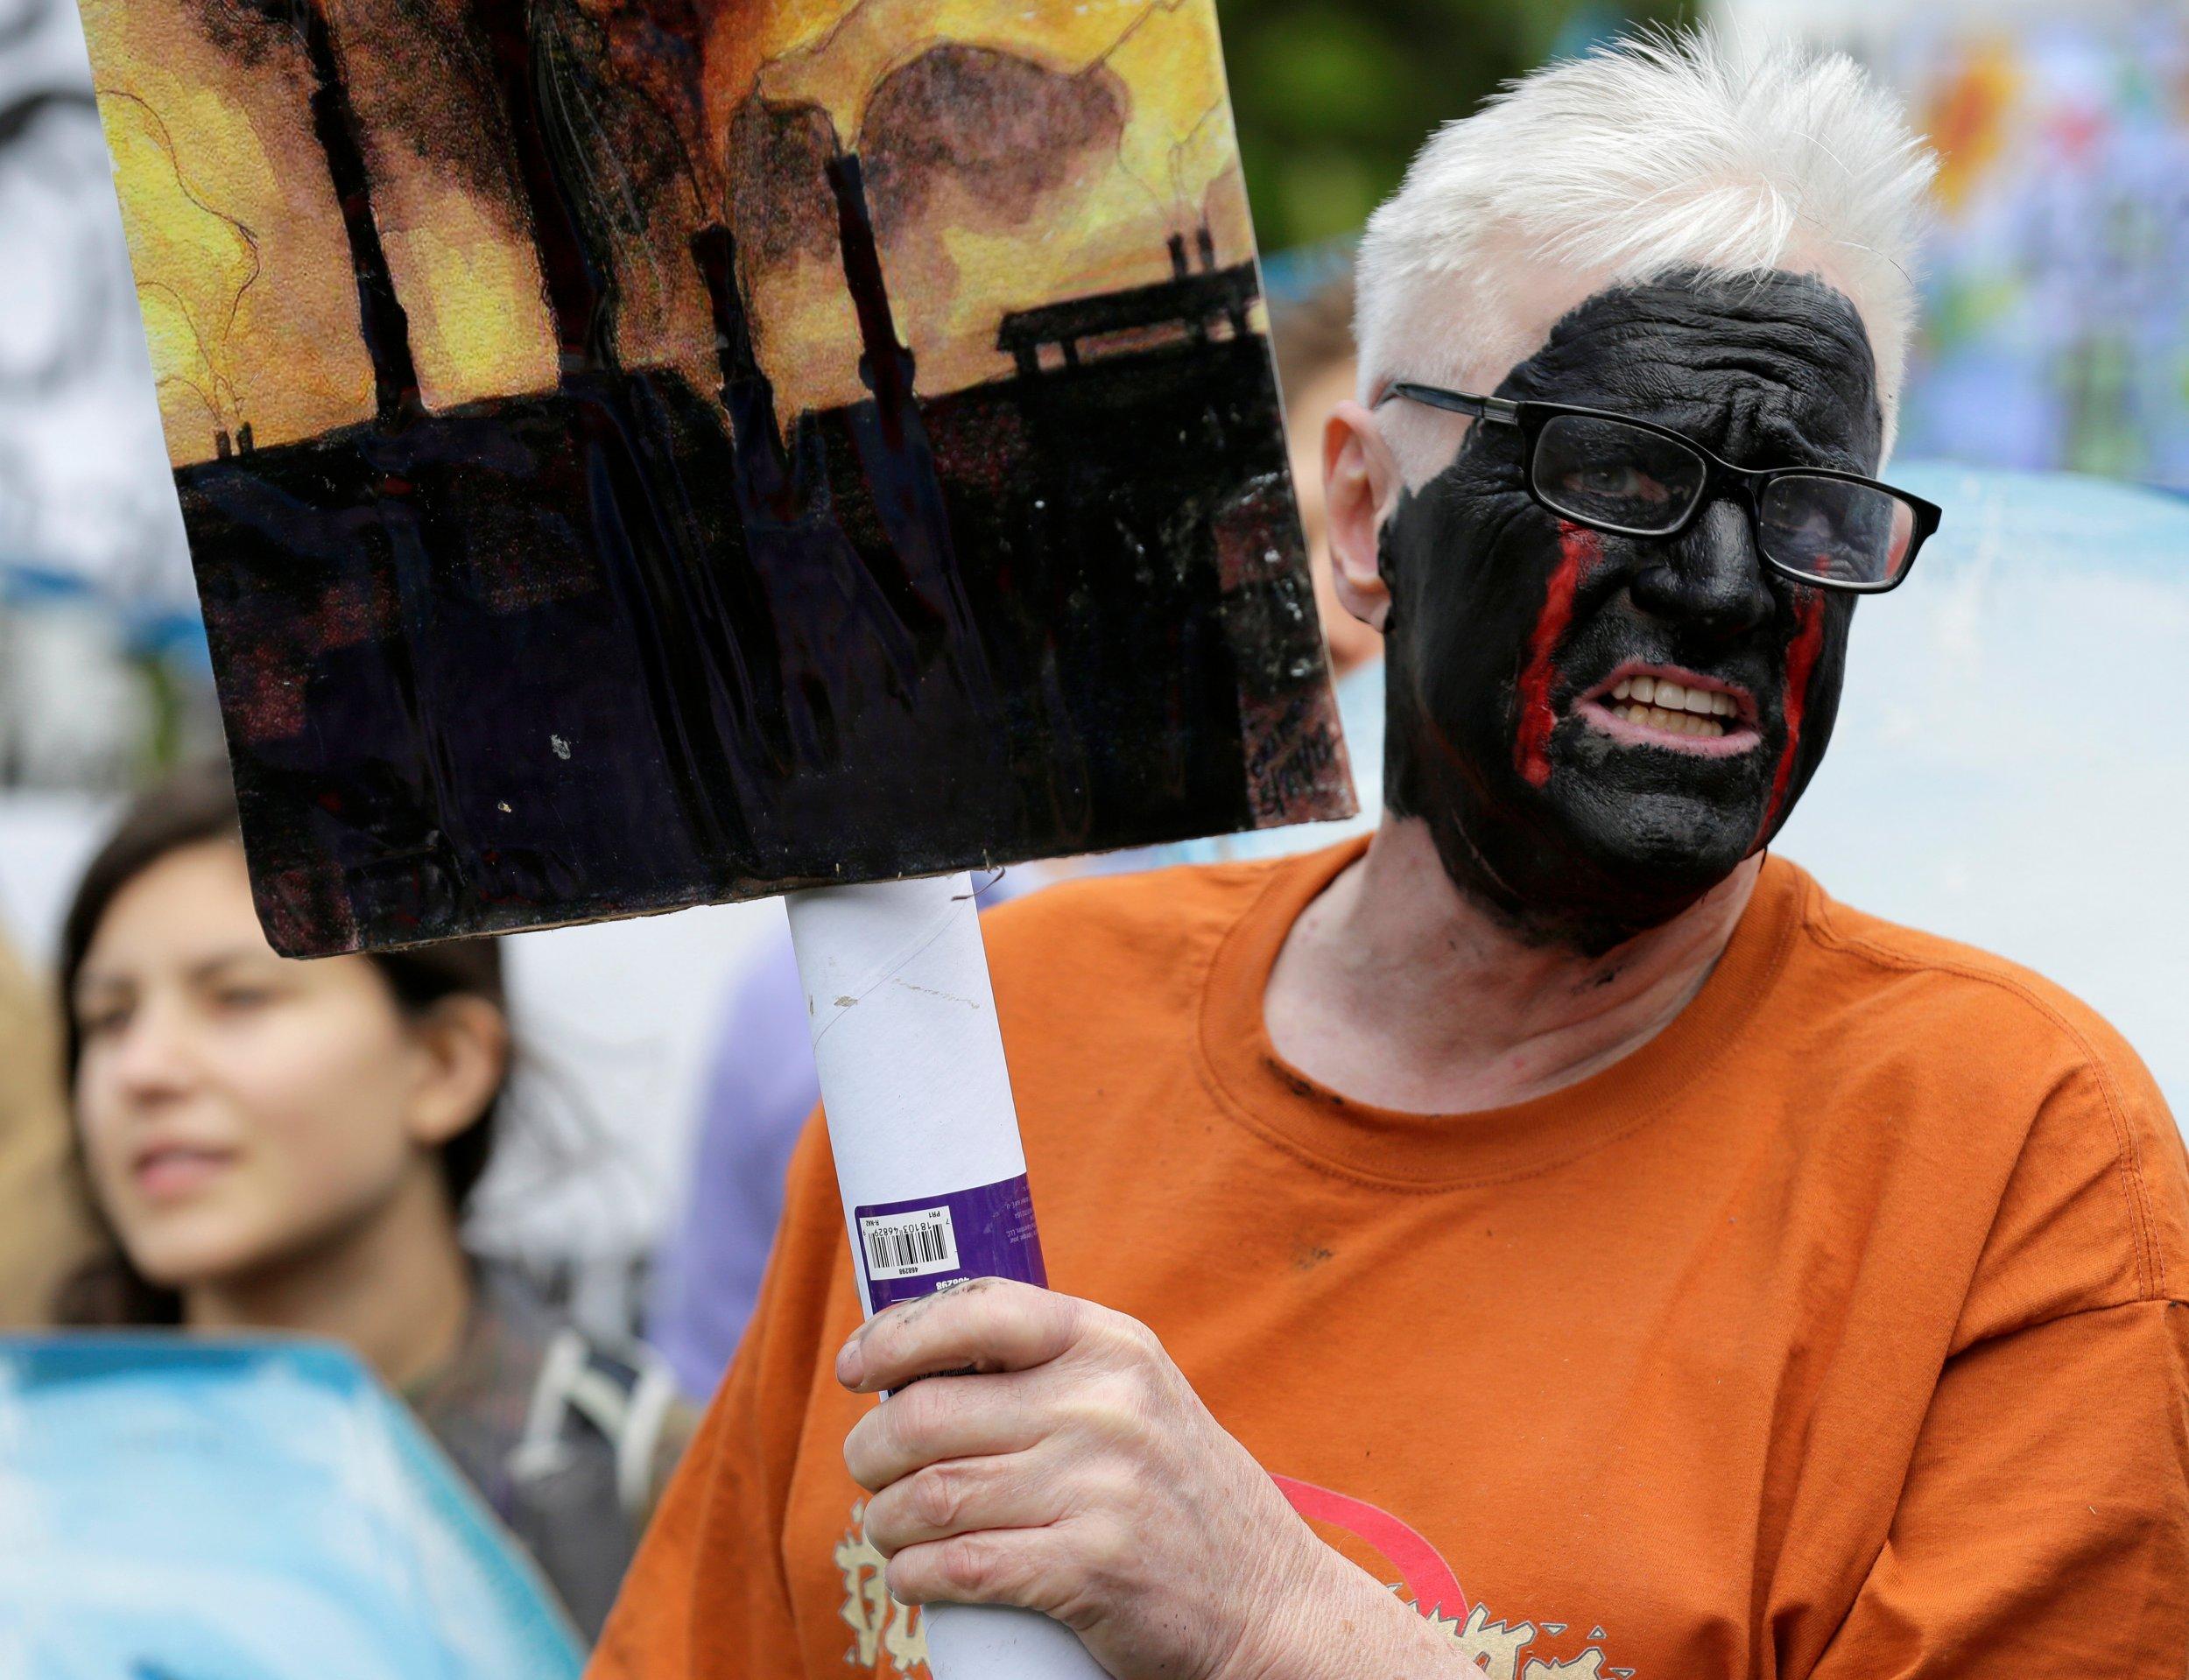 06_23_environmental_activist_murders_01